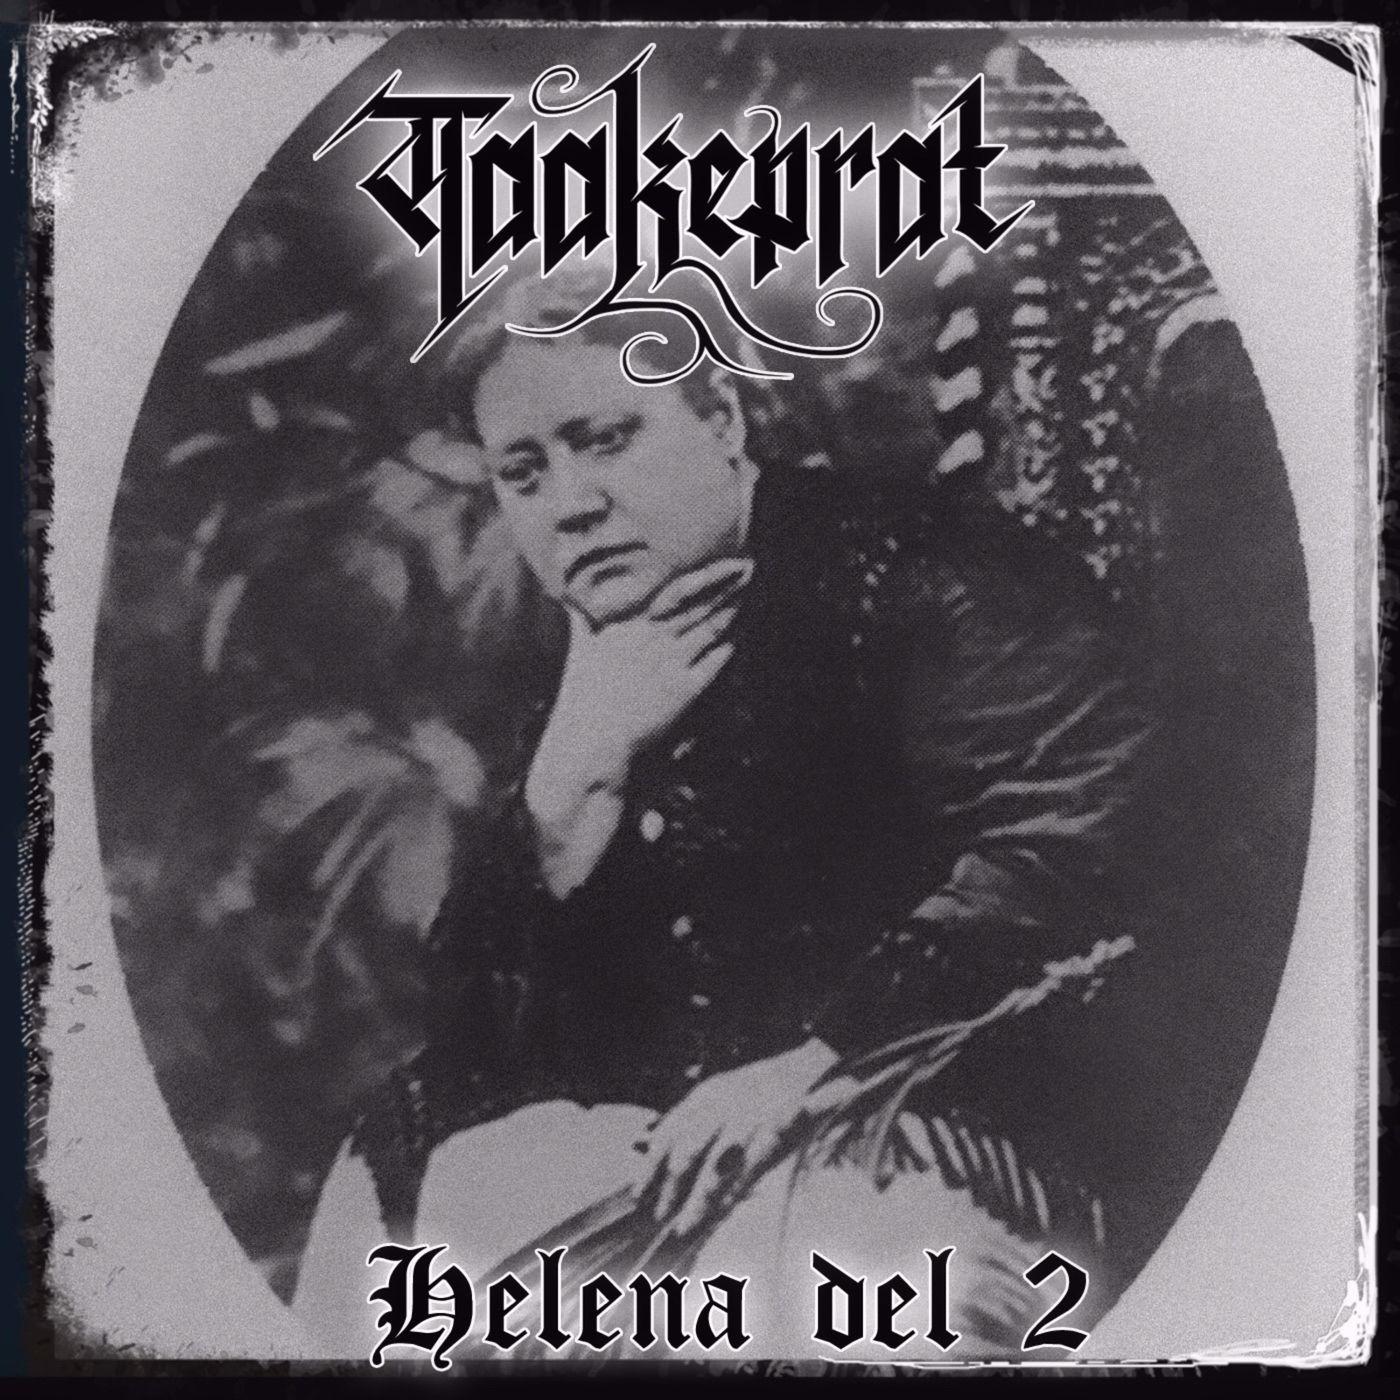 Episode 113 - Helena del 2